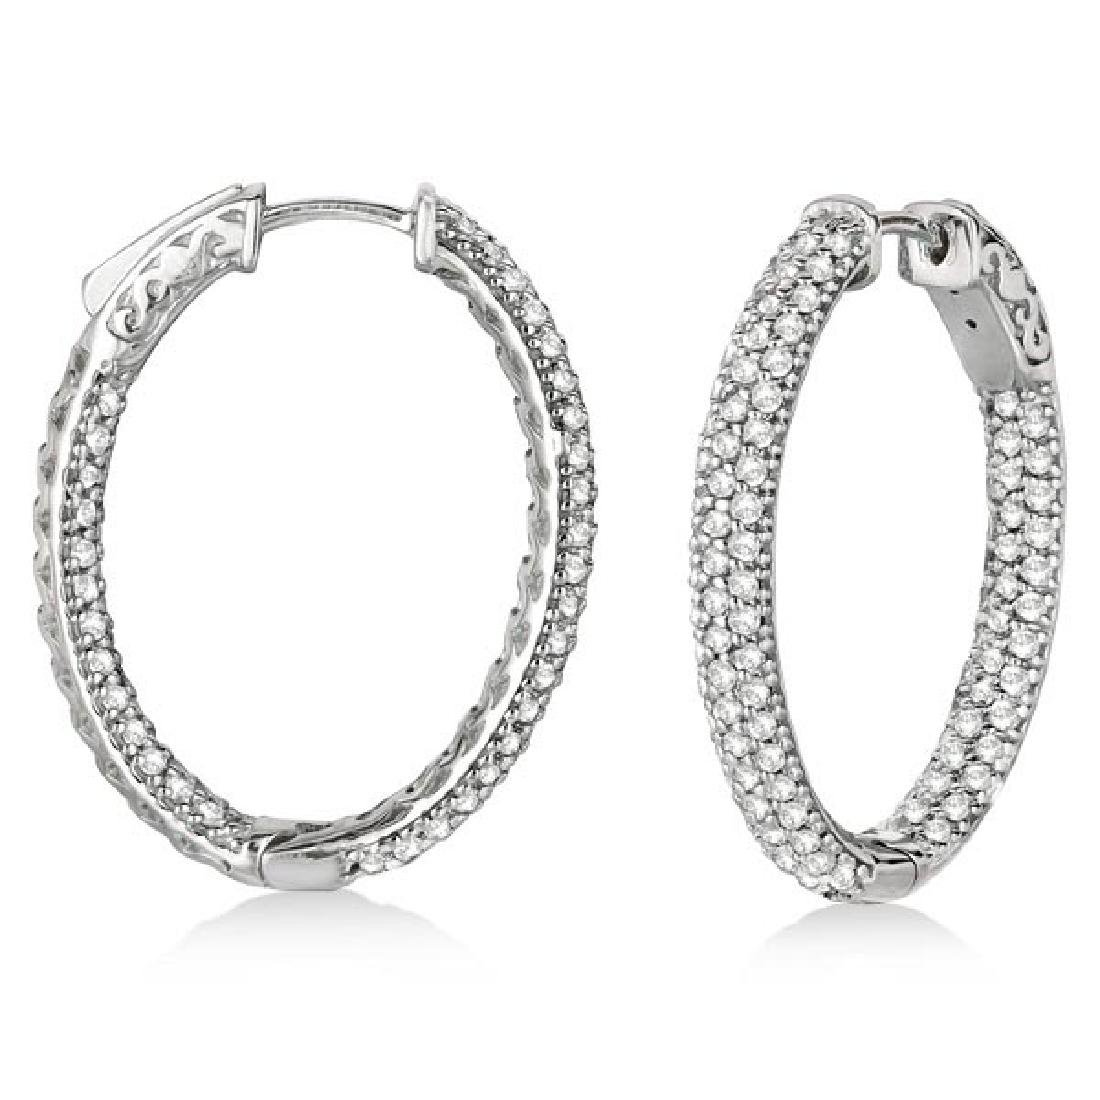 Pave-Set Inside-Outside Diamond Hoop Earrings 14k White